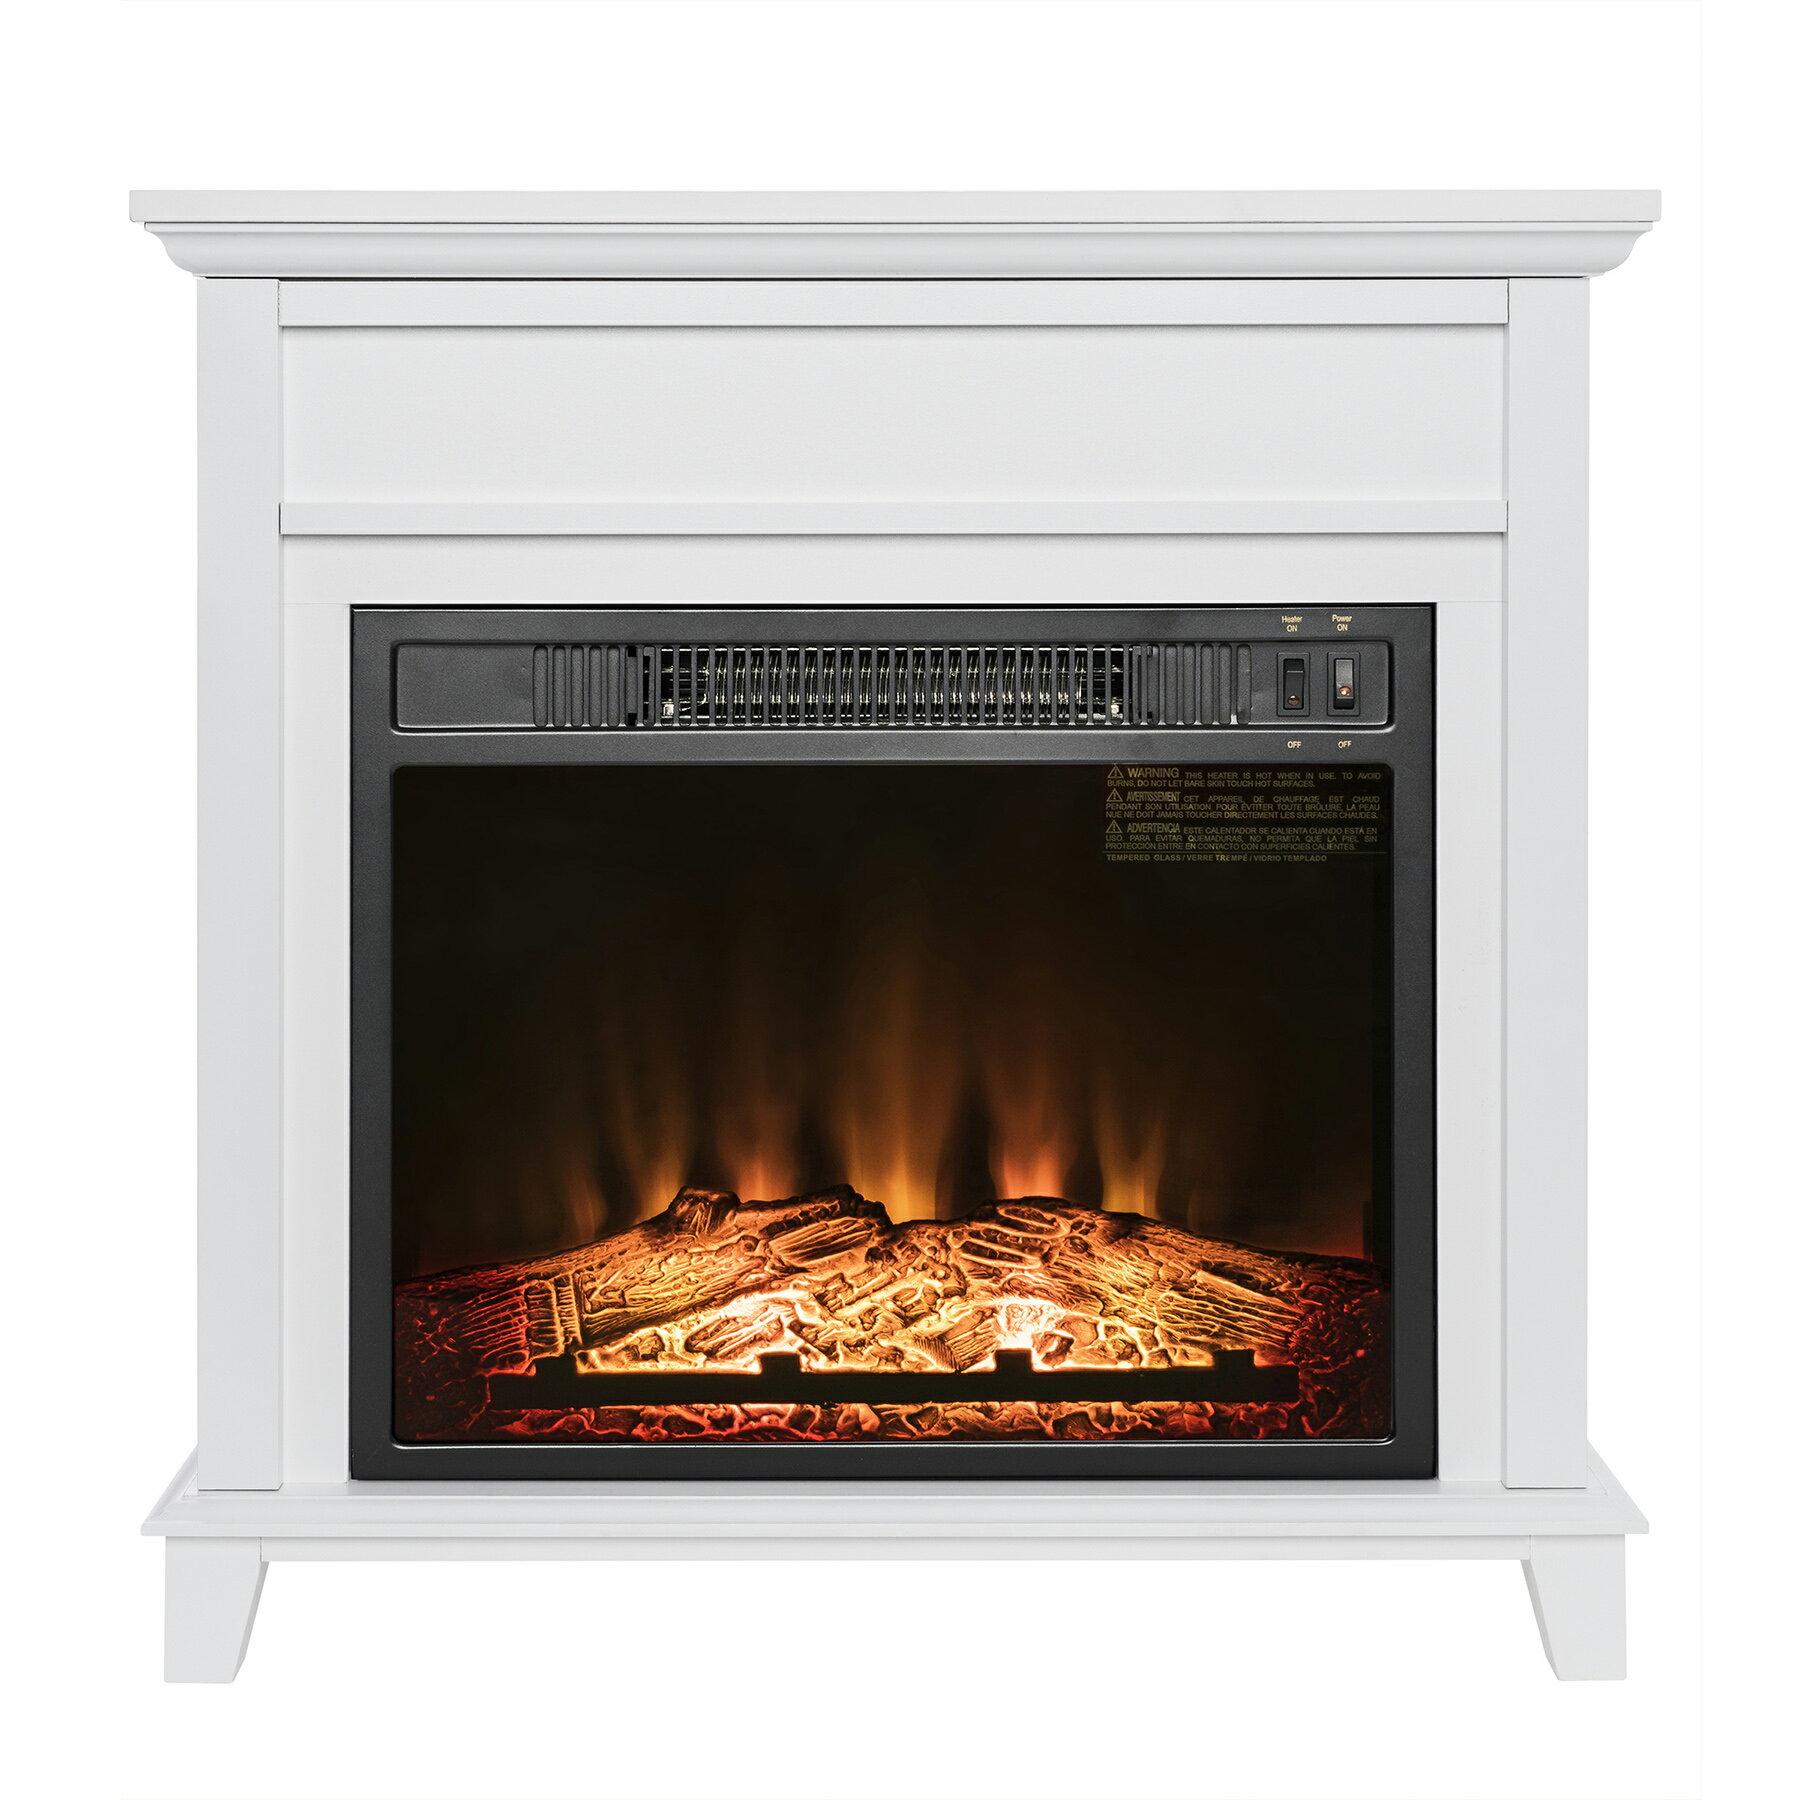 "AKDY 27"" Electric Fireplace Freestanding White Wooden Mantel Firebox 3D Flame w/ Logs Heater 0"